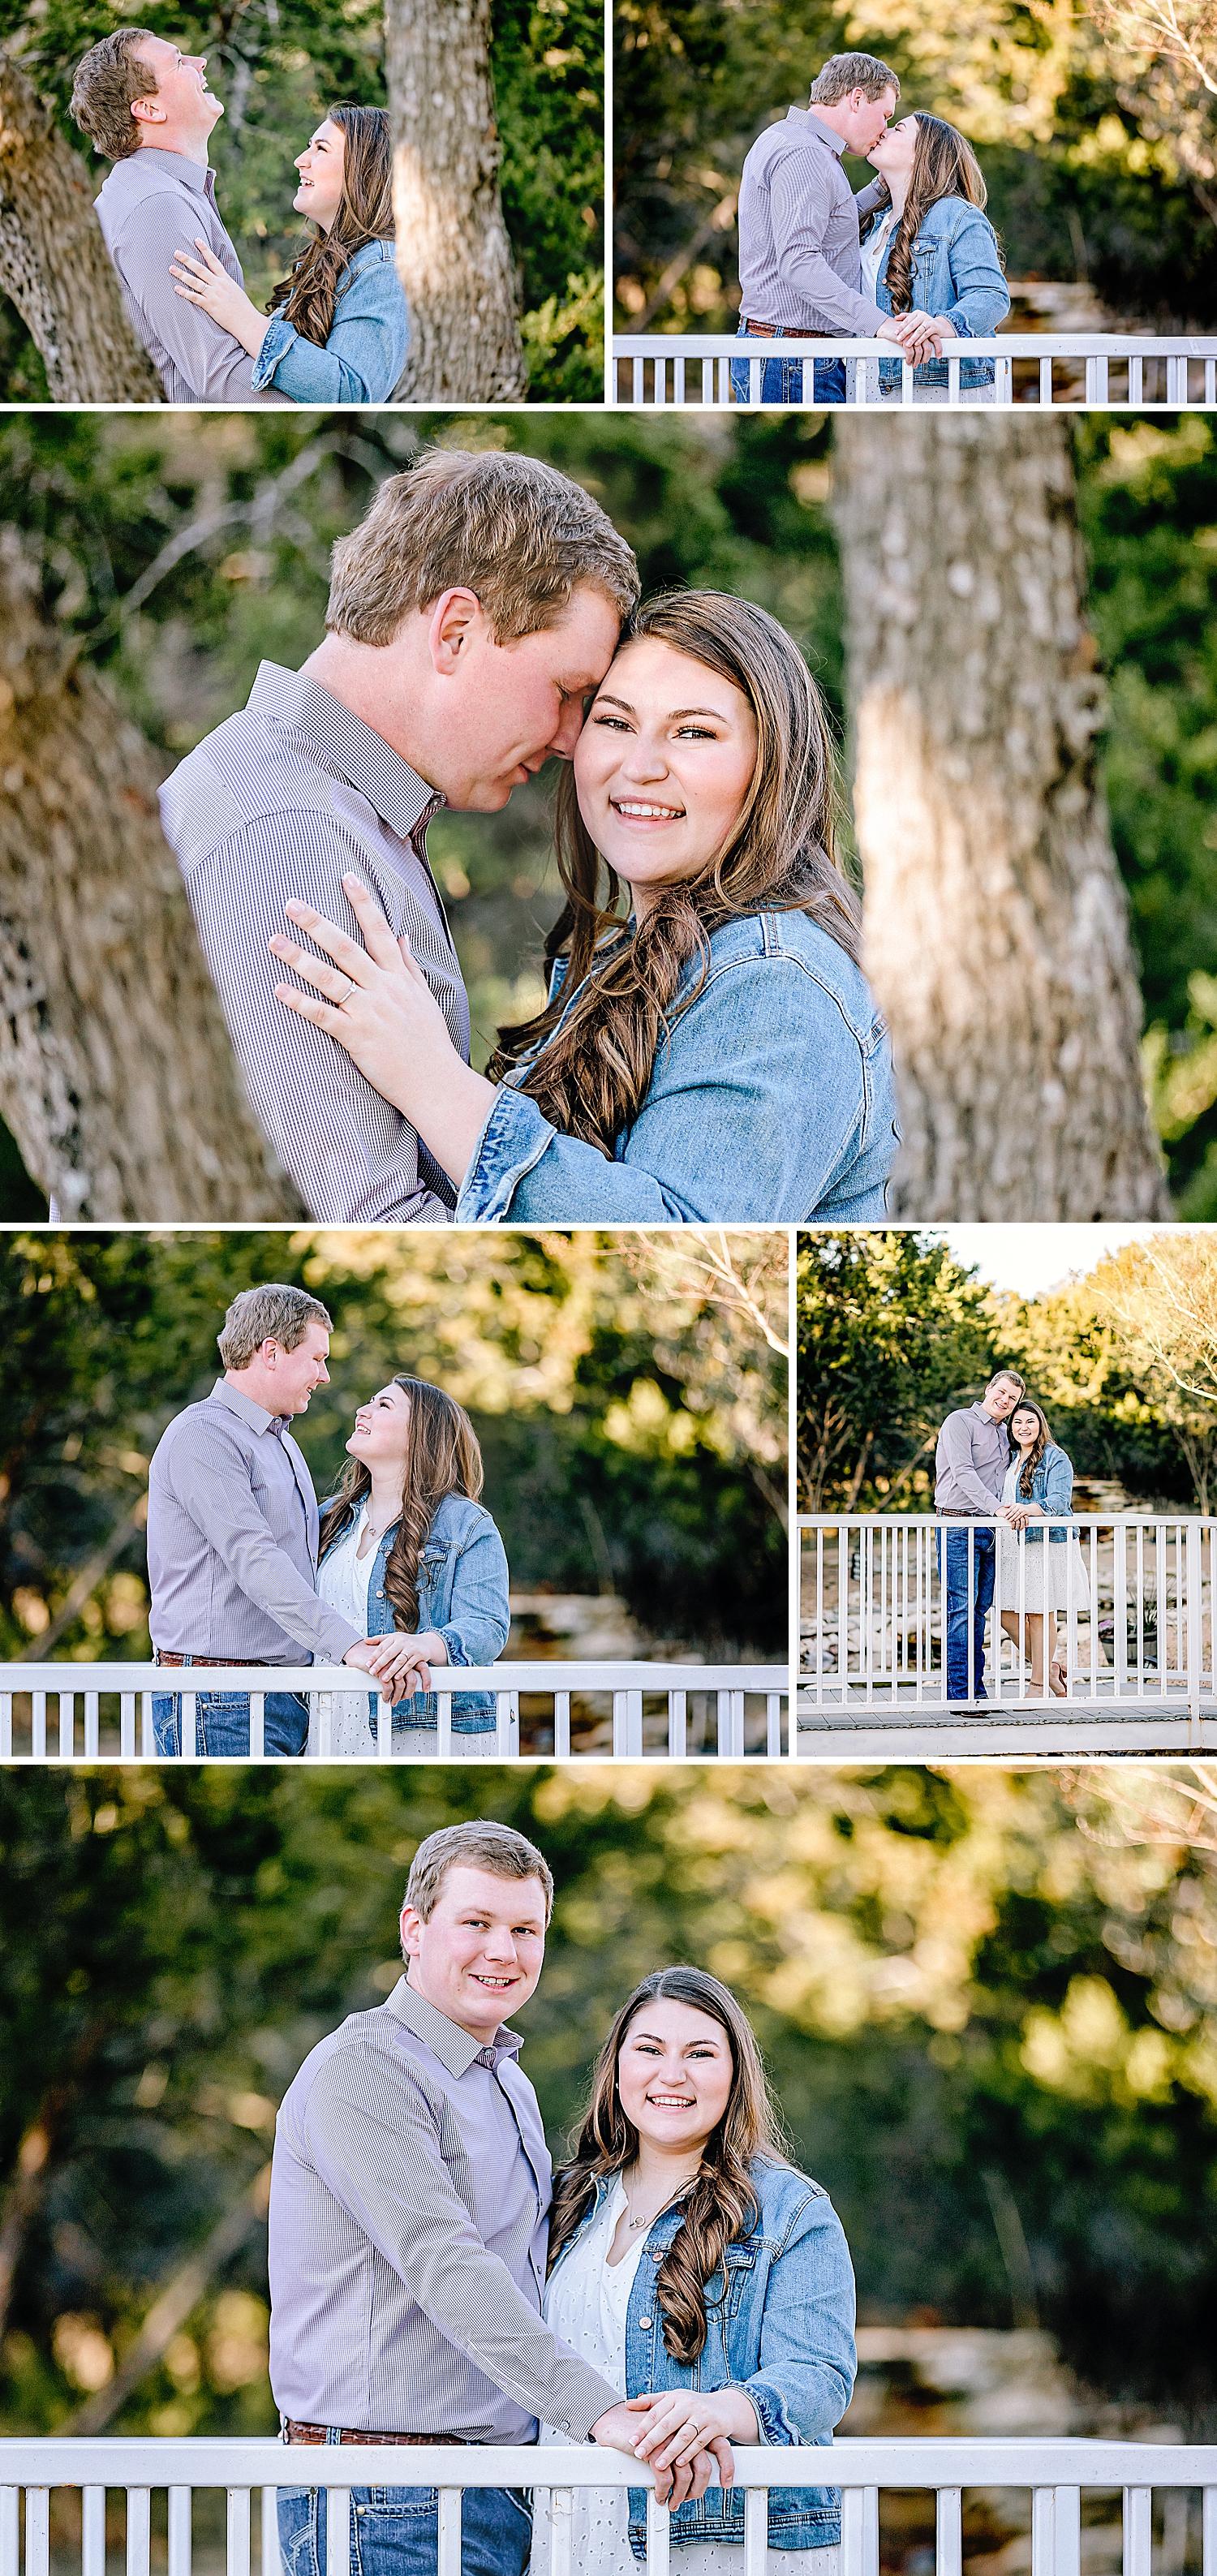 Engagement-photo-session-Western-Sky-wedding-venue-bulverde-texas-carly-barton-photography_0013.jpg